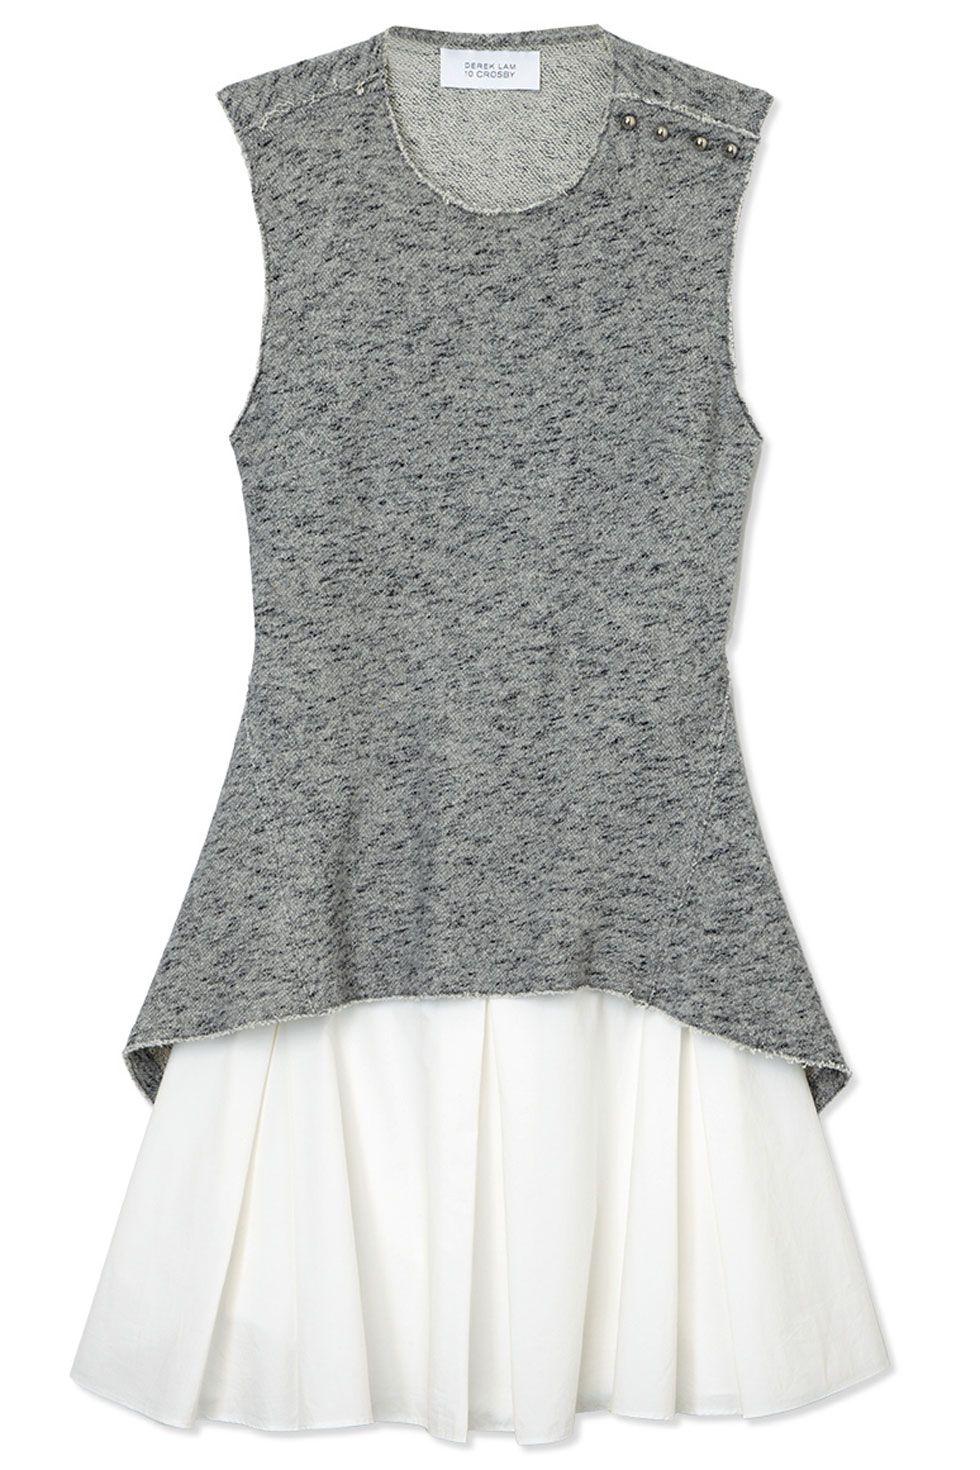 "<p>10 Crosby Derek Lam dress, $495, <a href=""https://shop.harpersbazaar.com/designers/10-crosby-derek-lam/flared-skirt-dress/"" target=""_blank"">shopBAZAAR.com</a></p>"